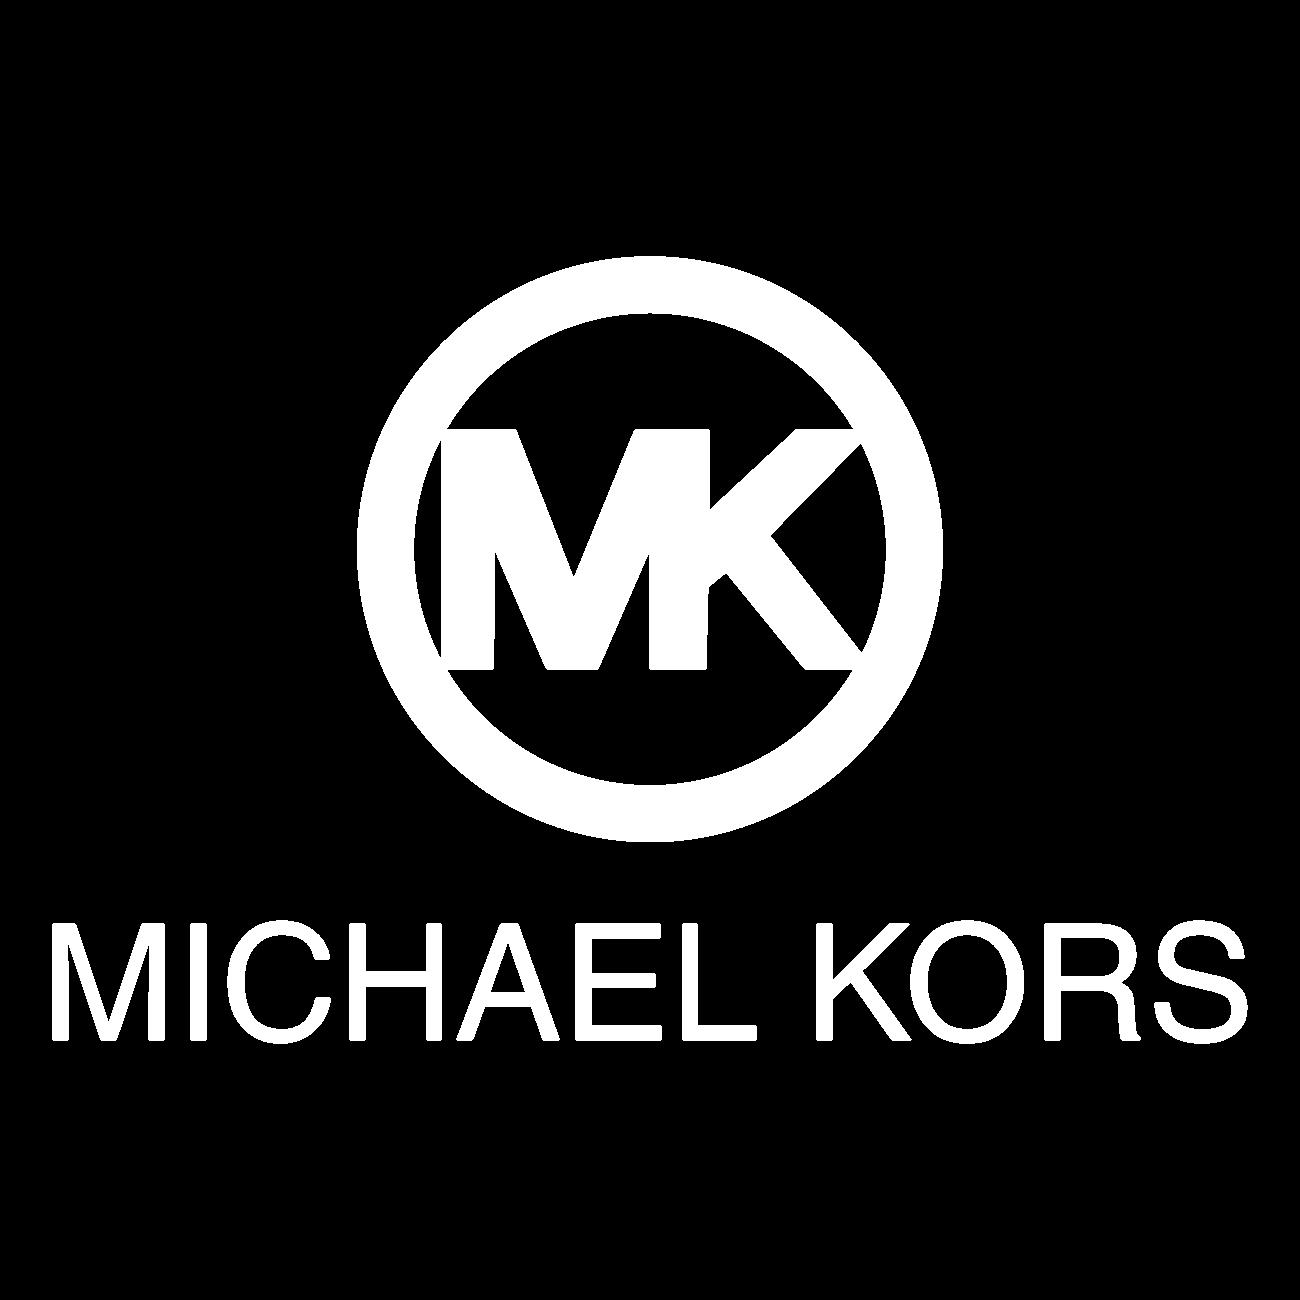 Shop Your Favorites On Sale: Now Under $200 at MICHAEL KORS!